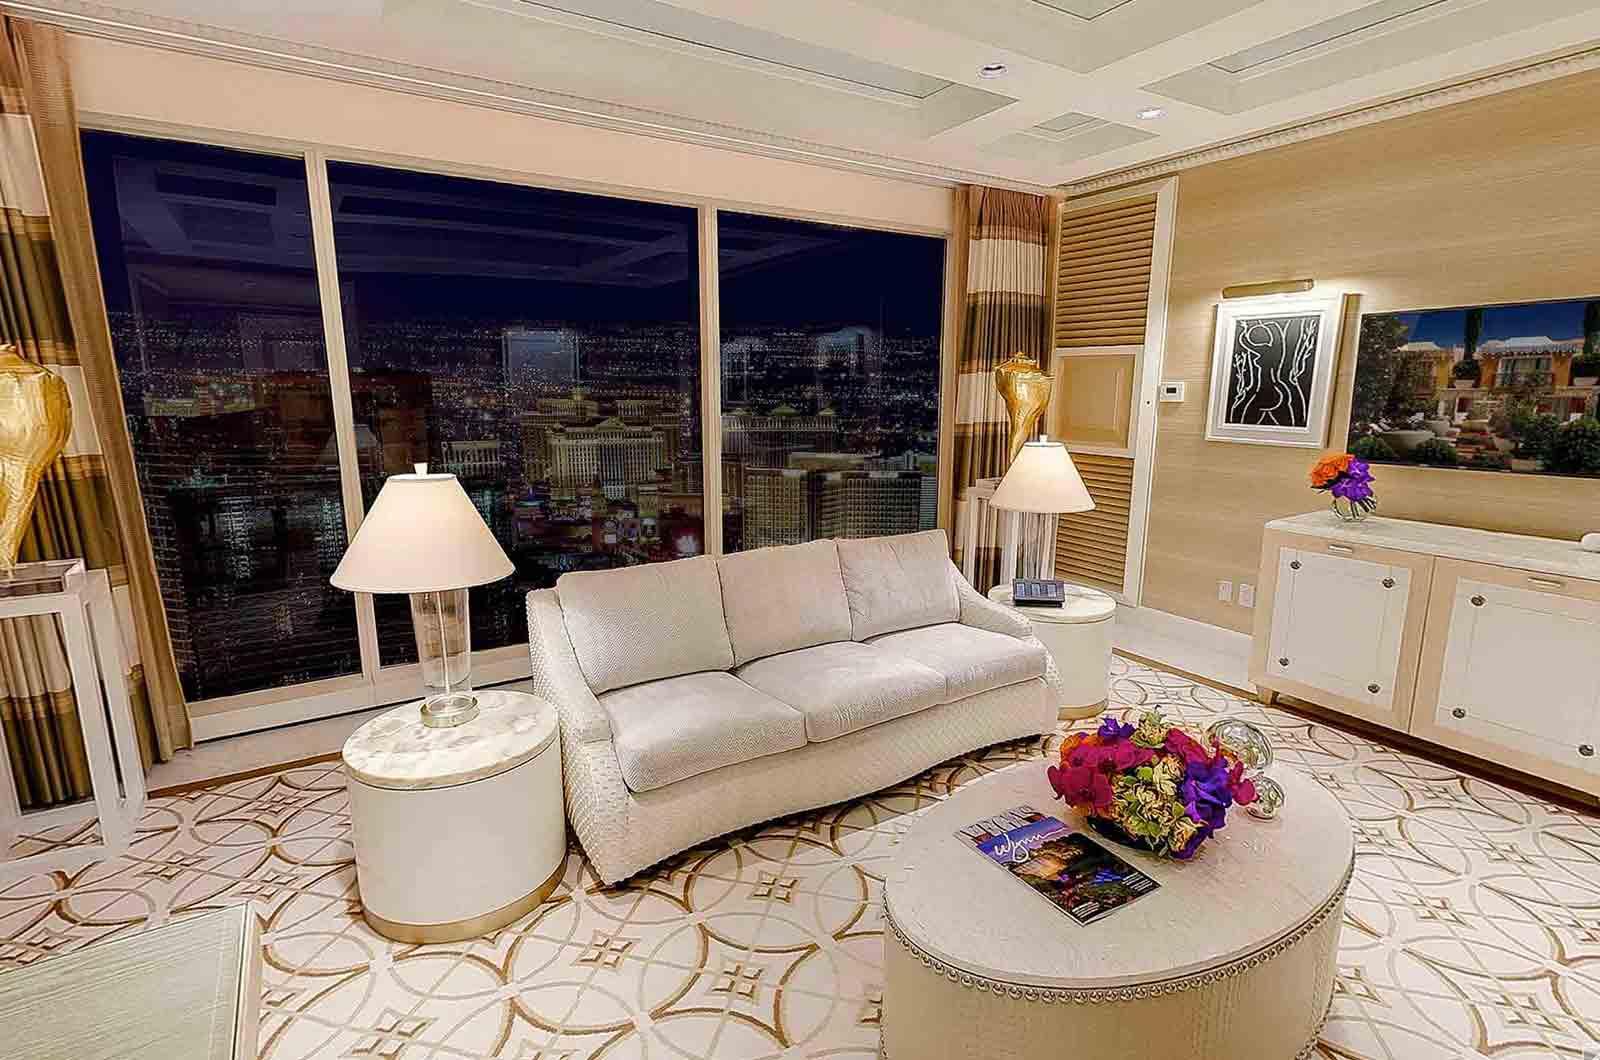 Hotel-Virtual-Tour-Photographer-_-Hotel-Virtual-Tour-Photography-Company